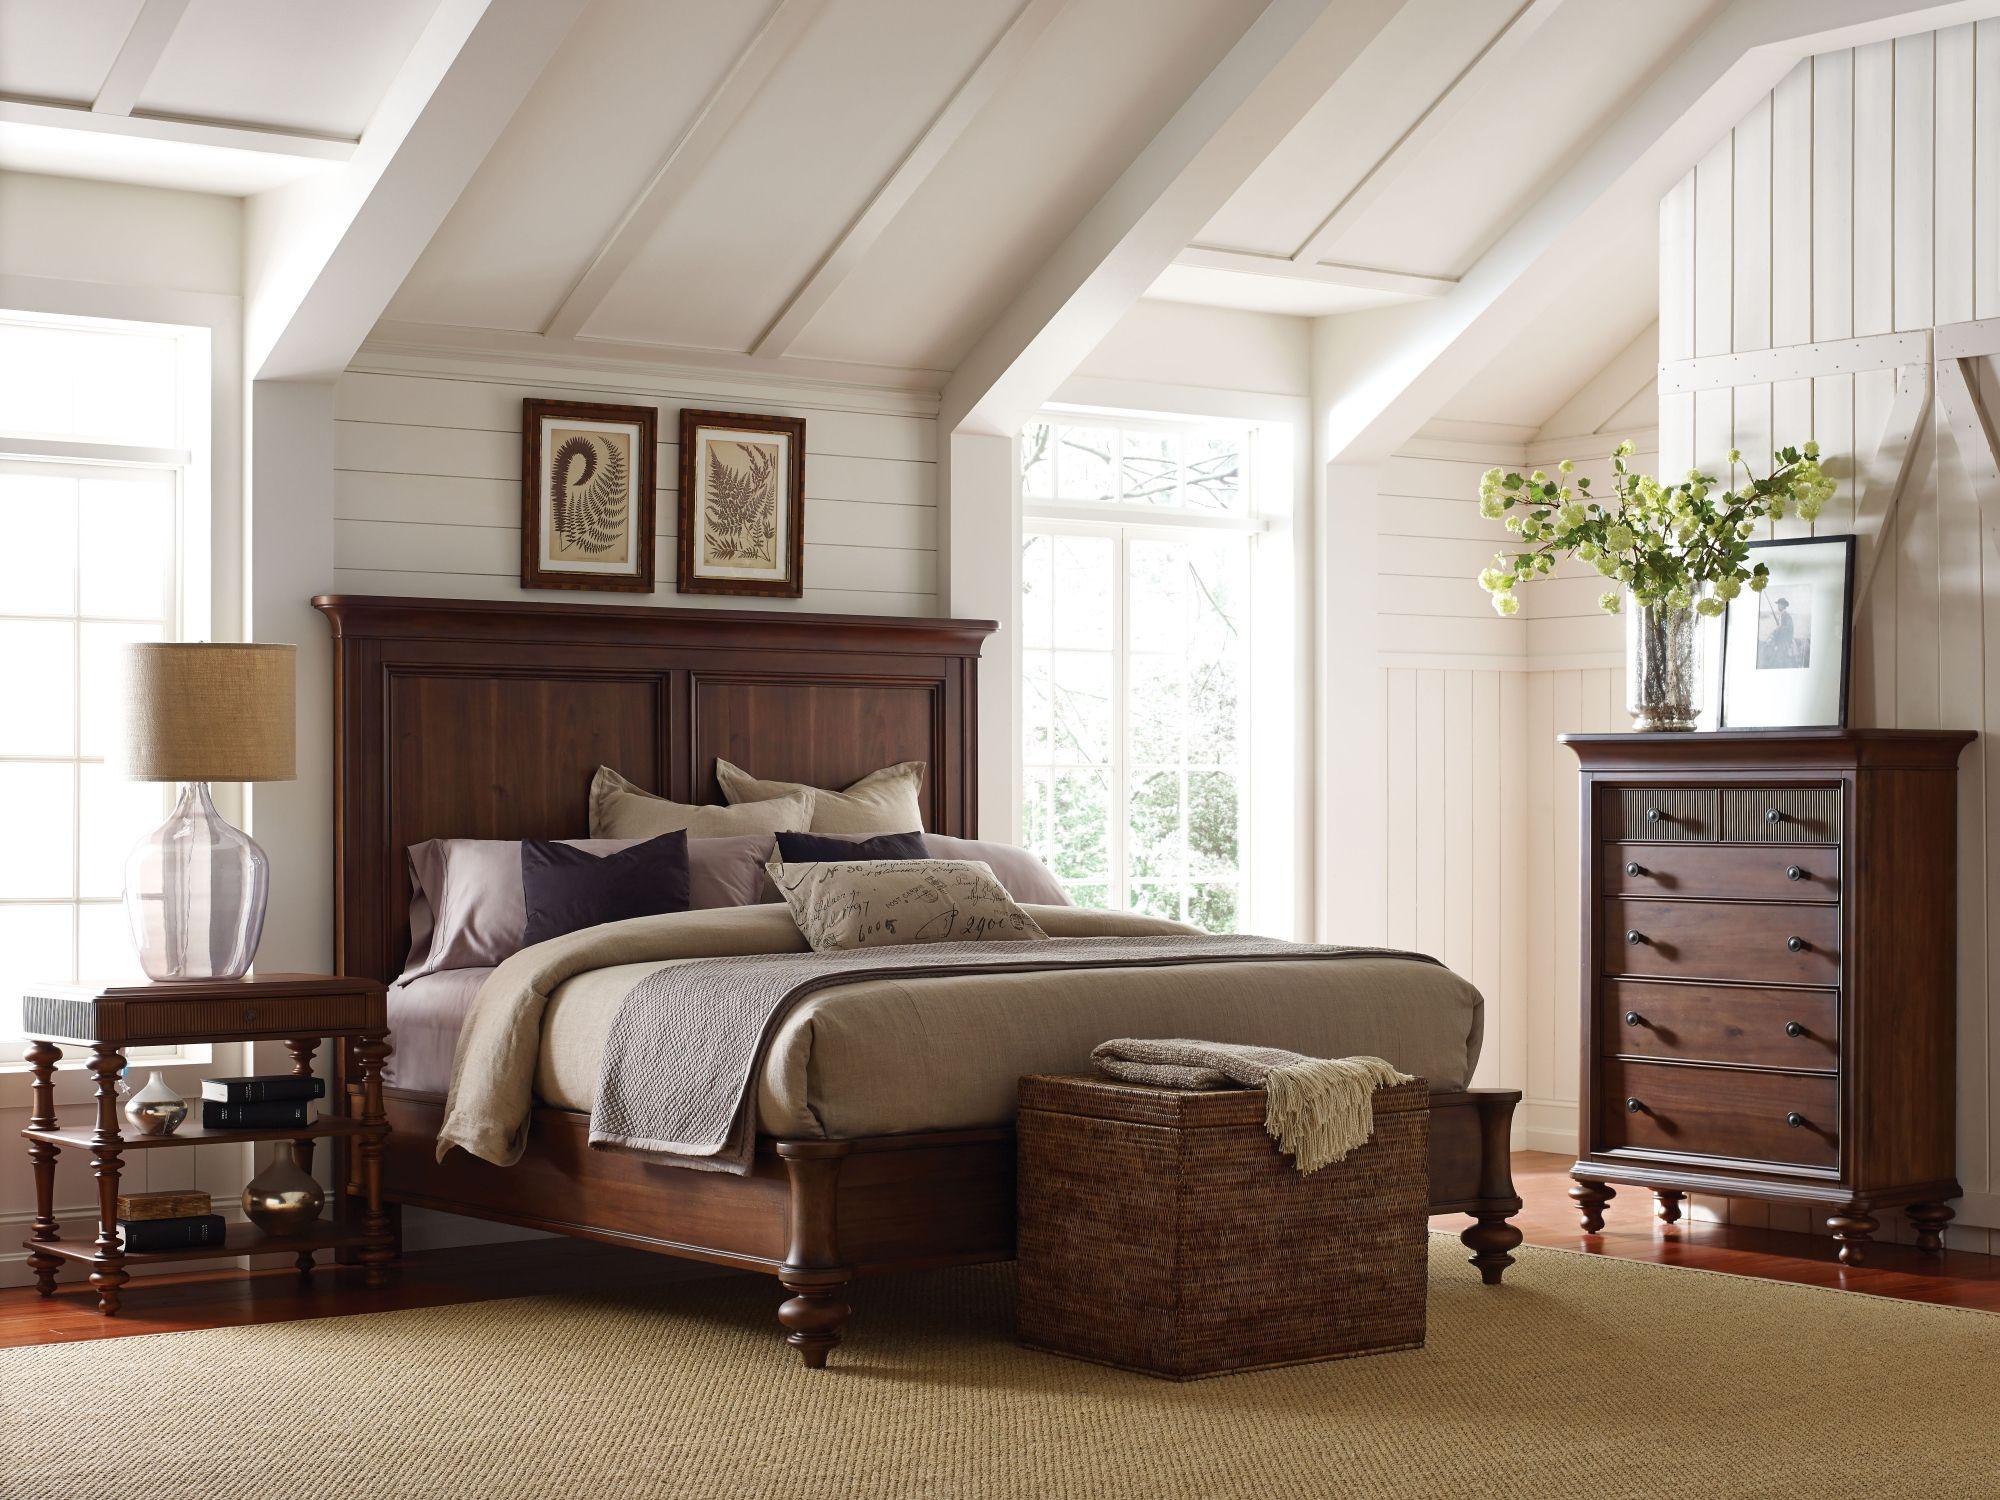 broyhill furniture cascade bedroom collection attic retreat